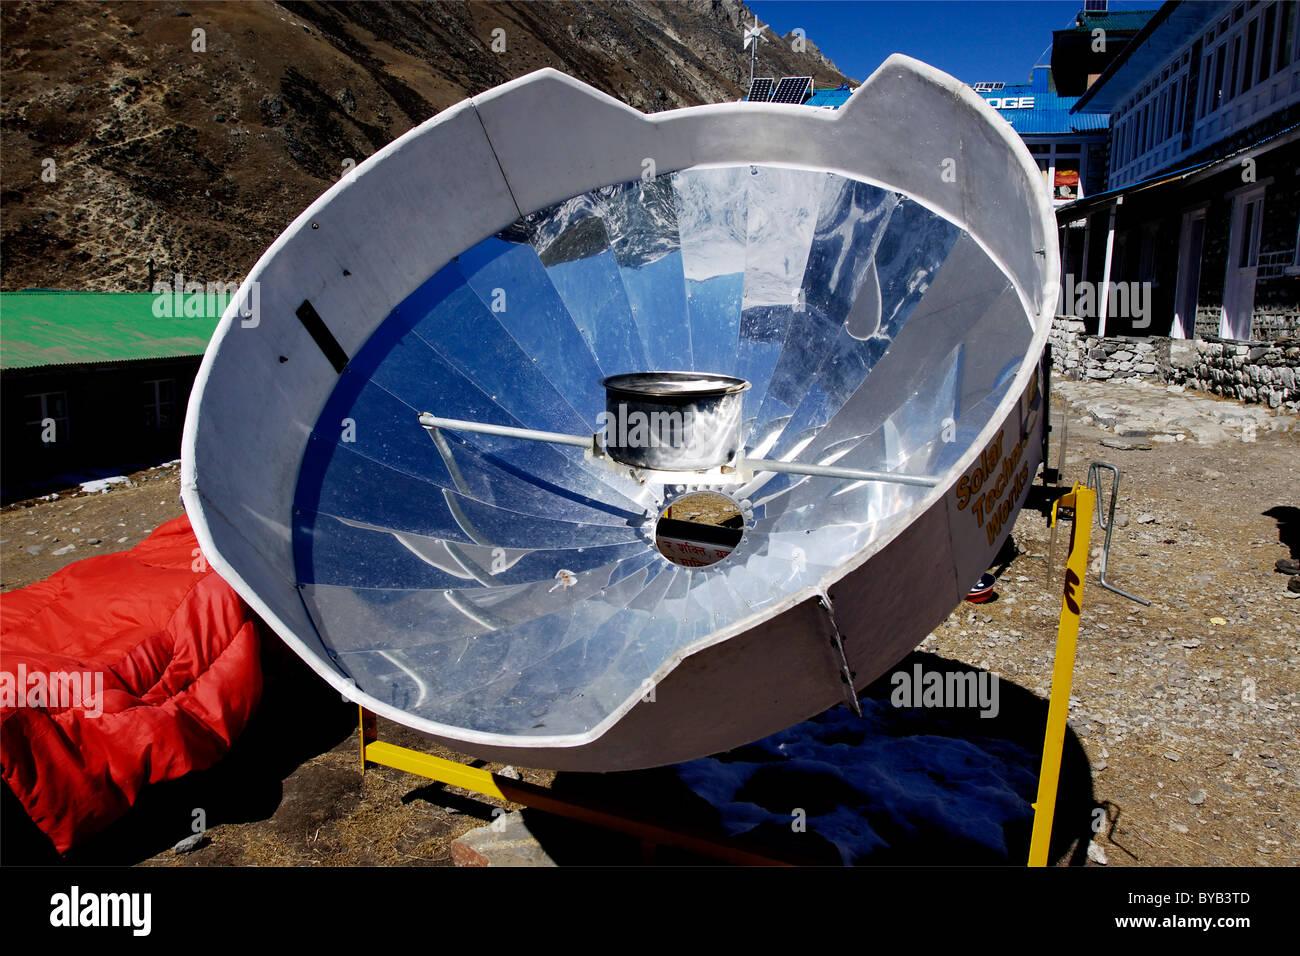 Solar mirror for heating water, Gokyo, Khumbu, Sagarmatha National Park, Nepal, Asia - Stock Image